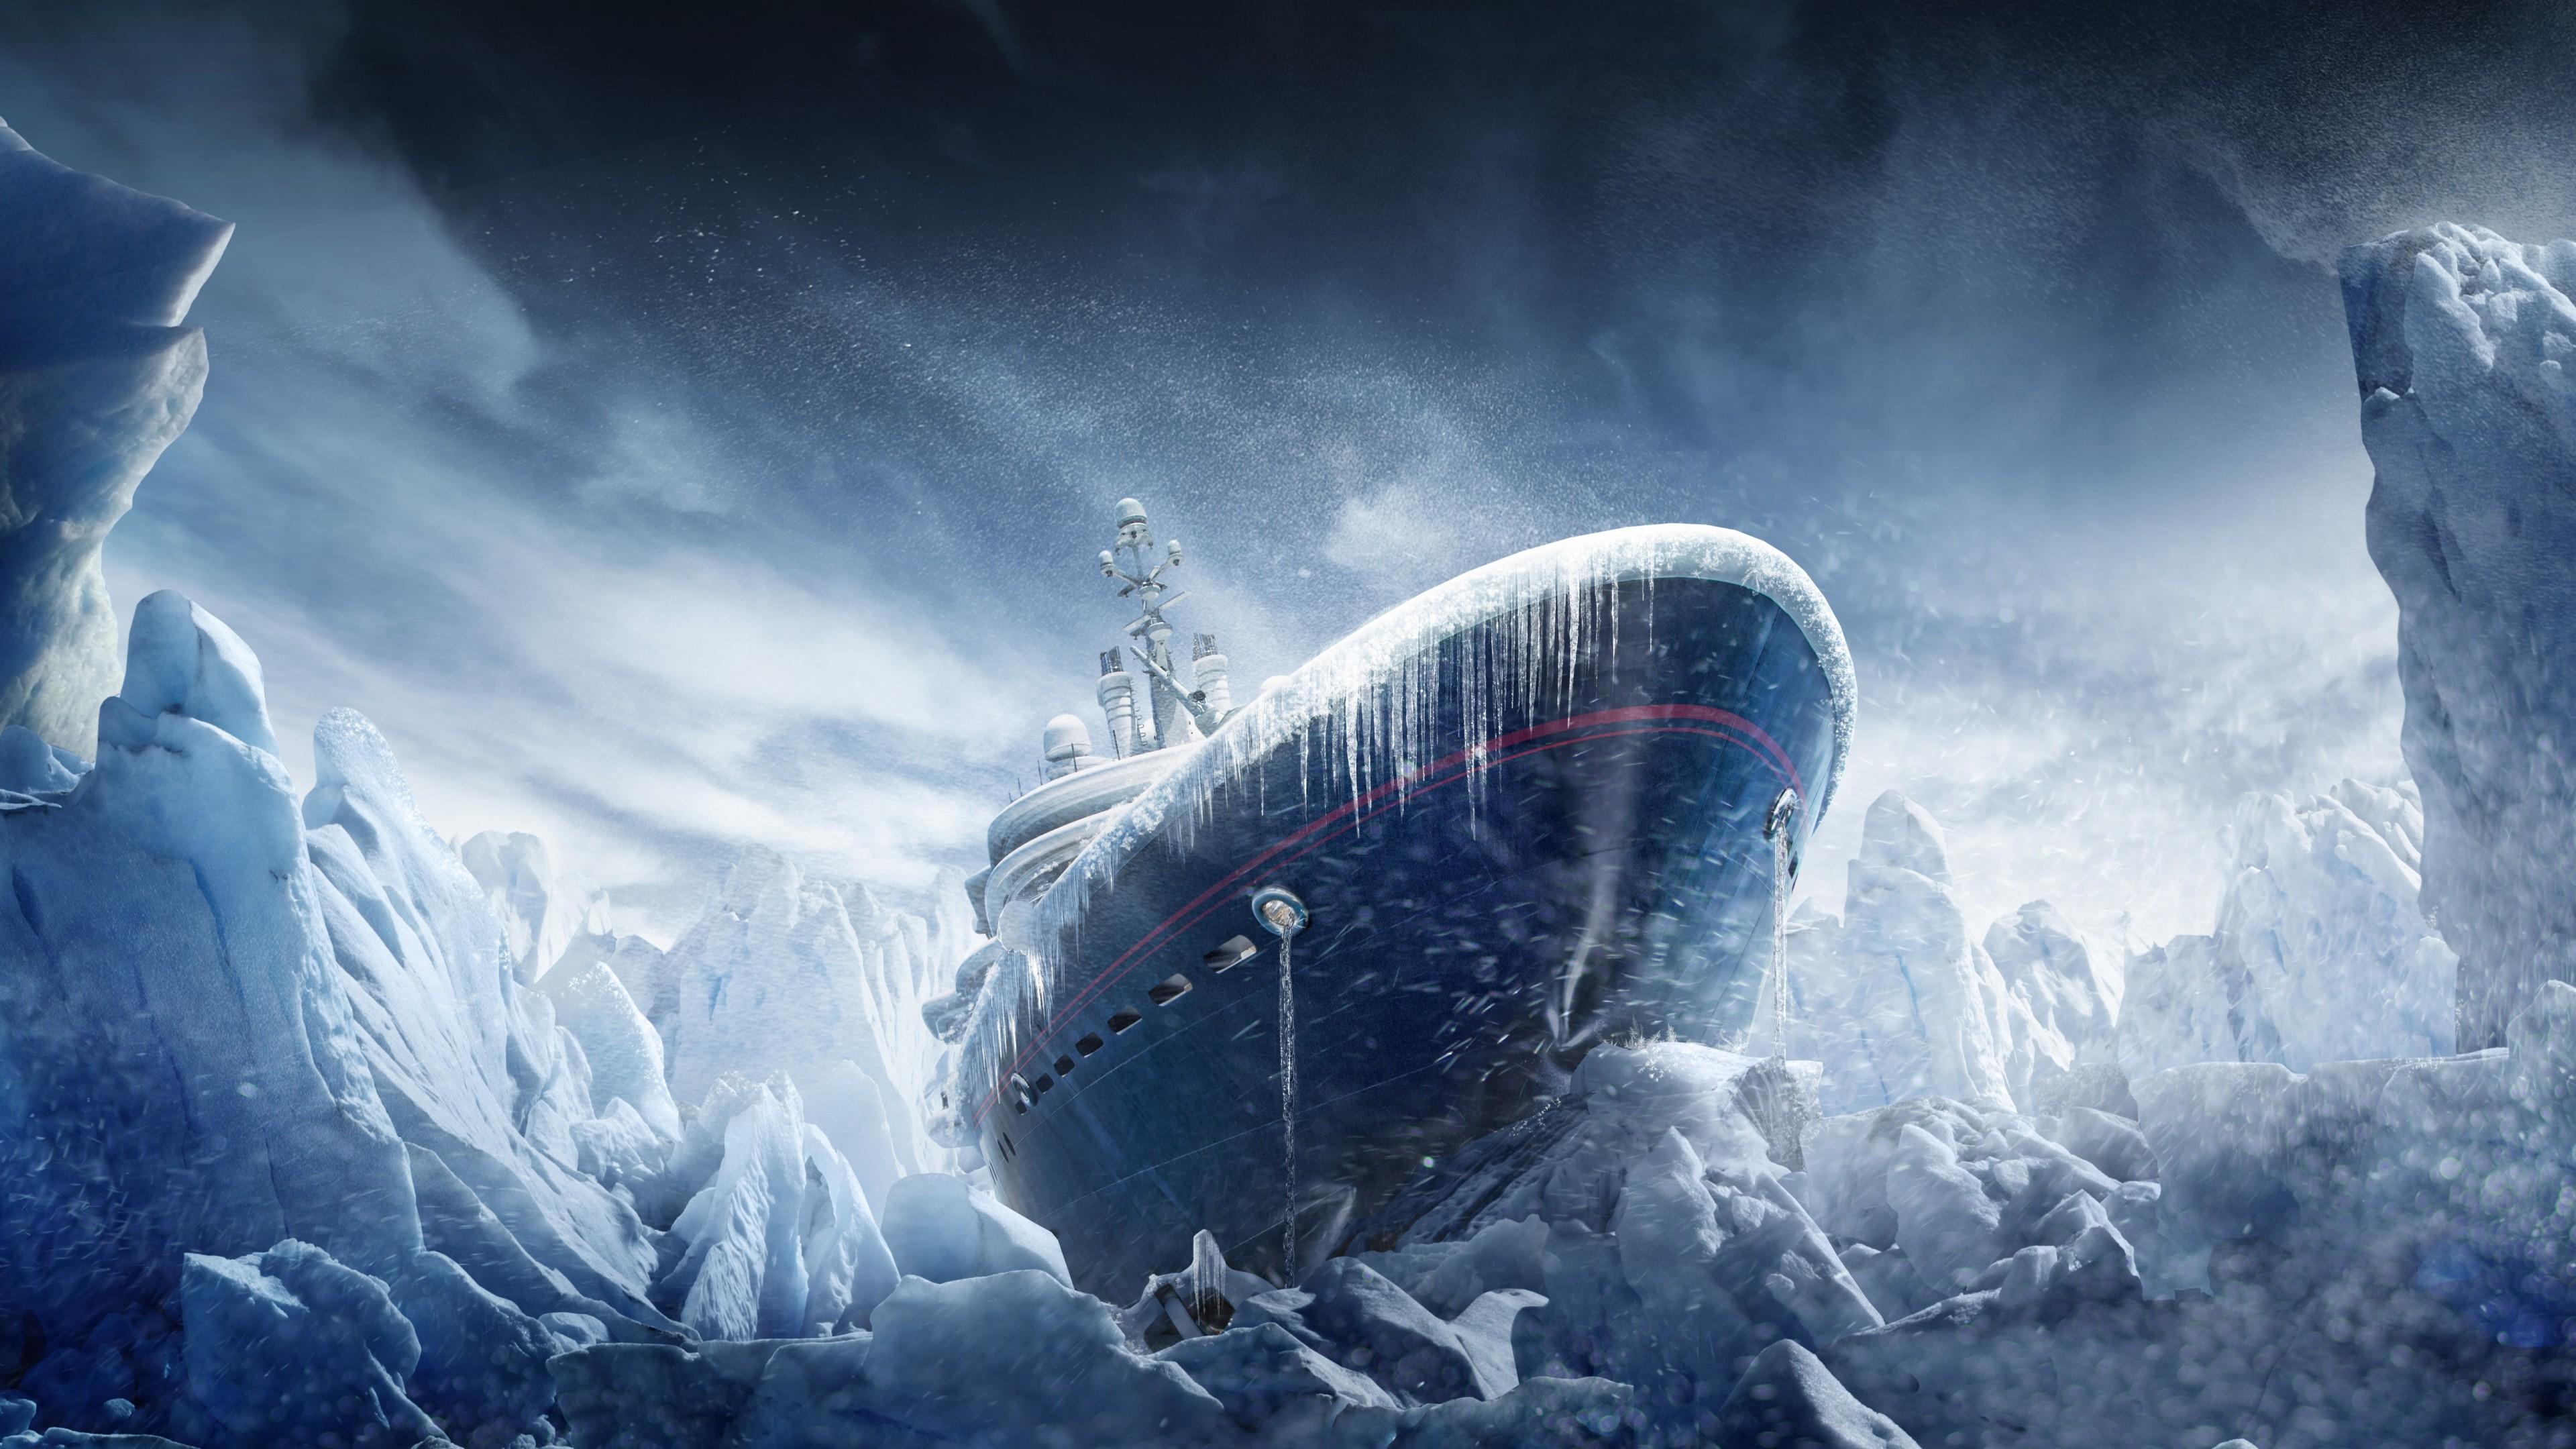 Wallpaper Tom Clancys Rainbow Six Siege operation black ice 3840x2160